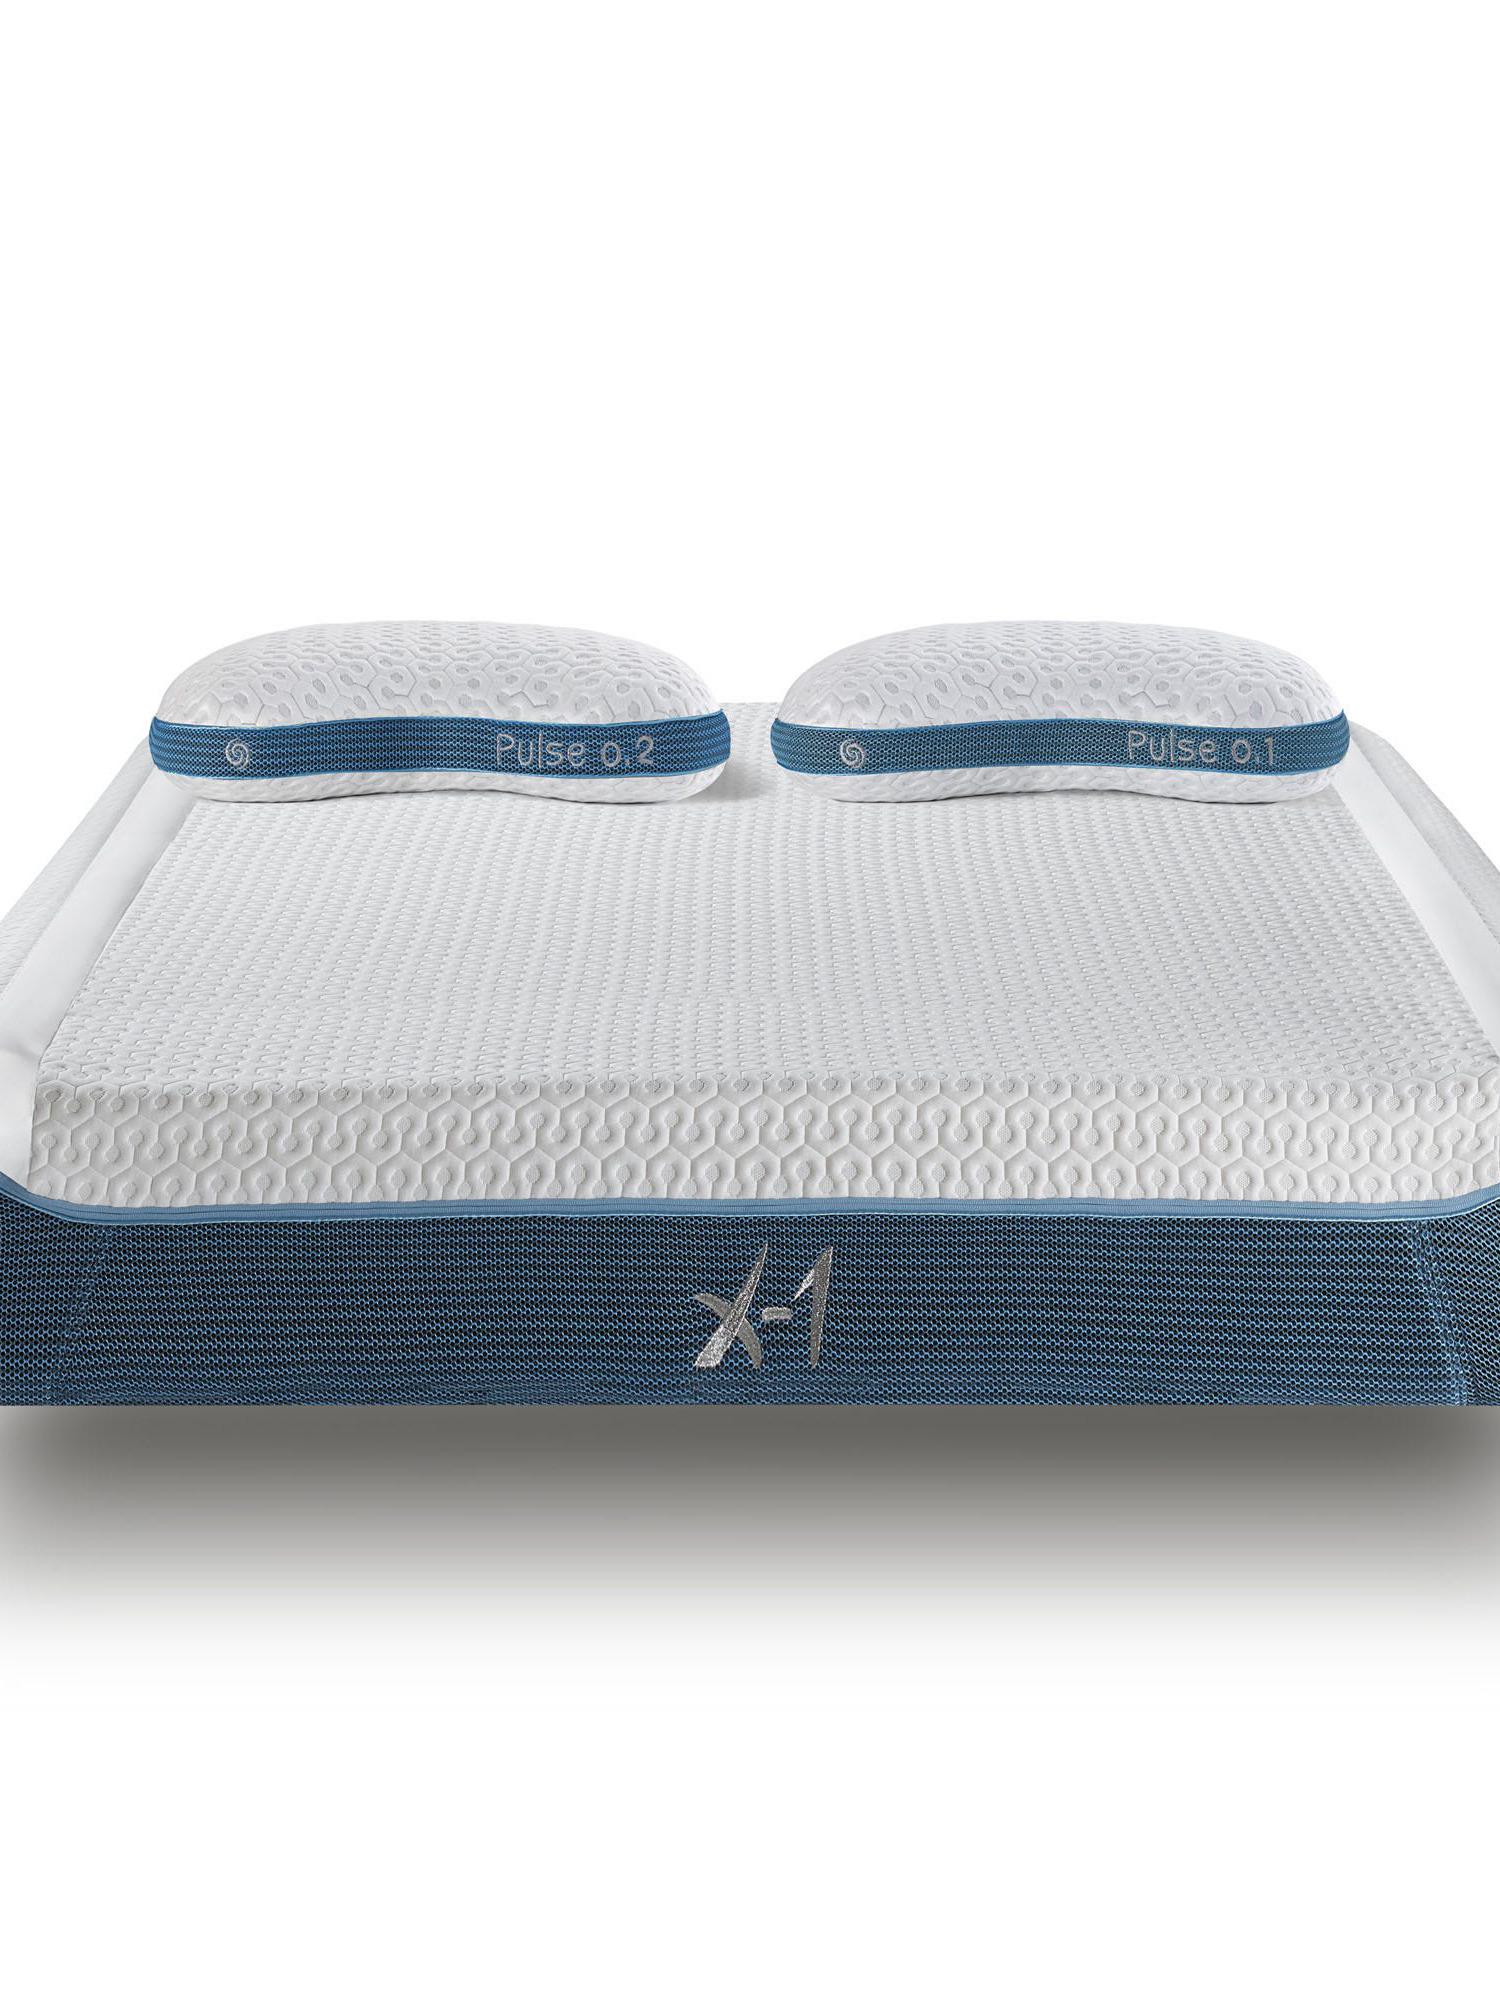 《Bedgear》2020秋冬床垫系列Lookbook